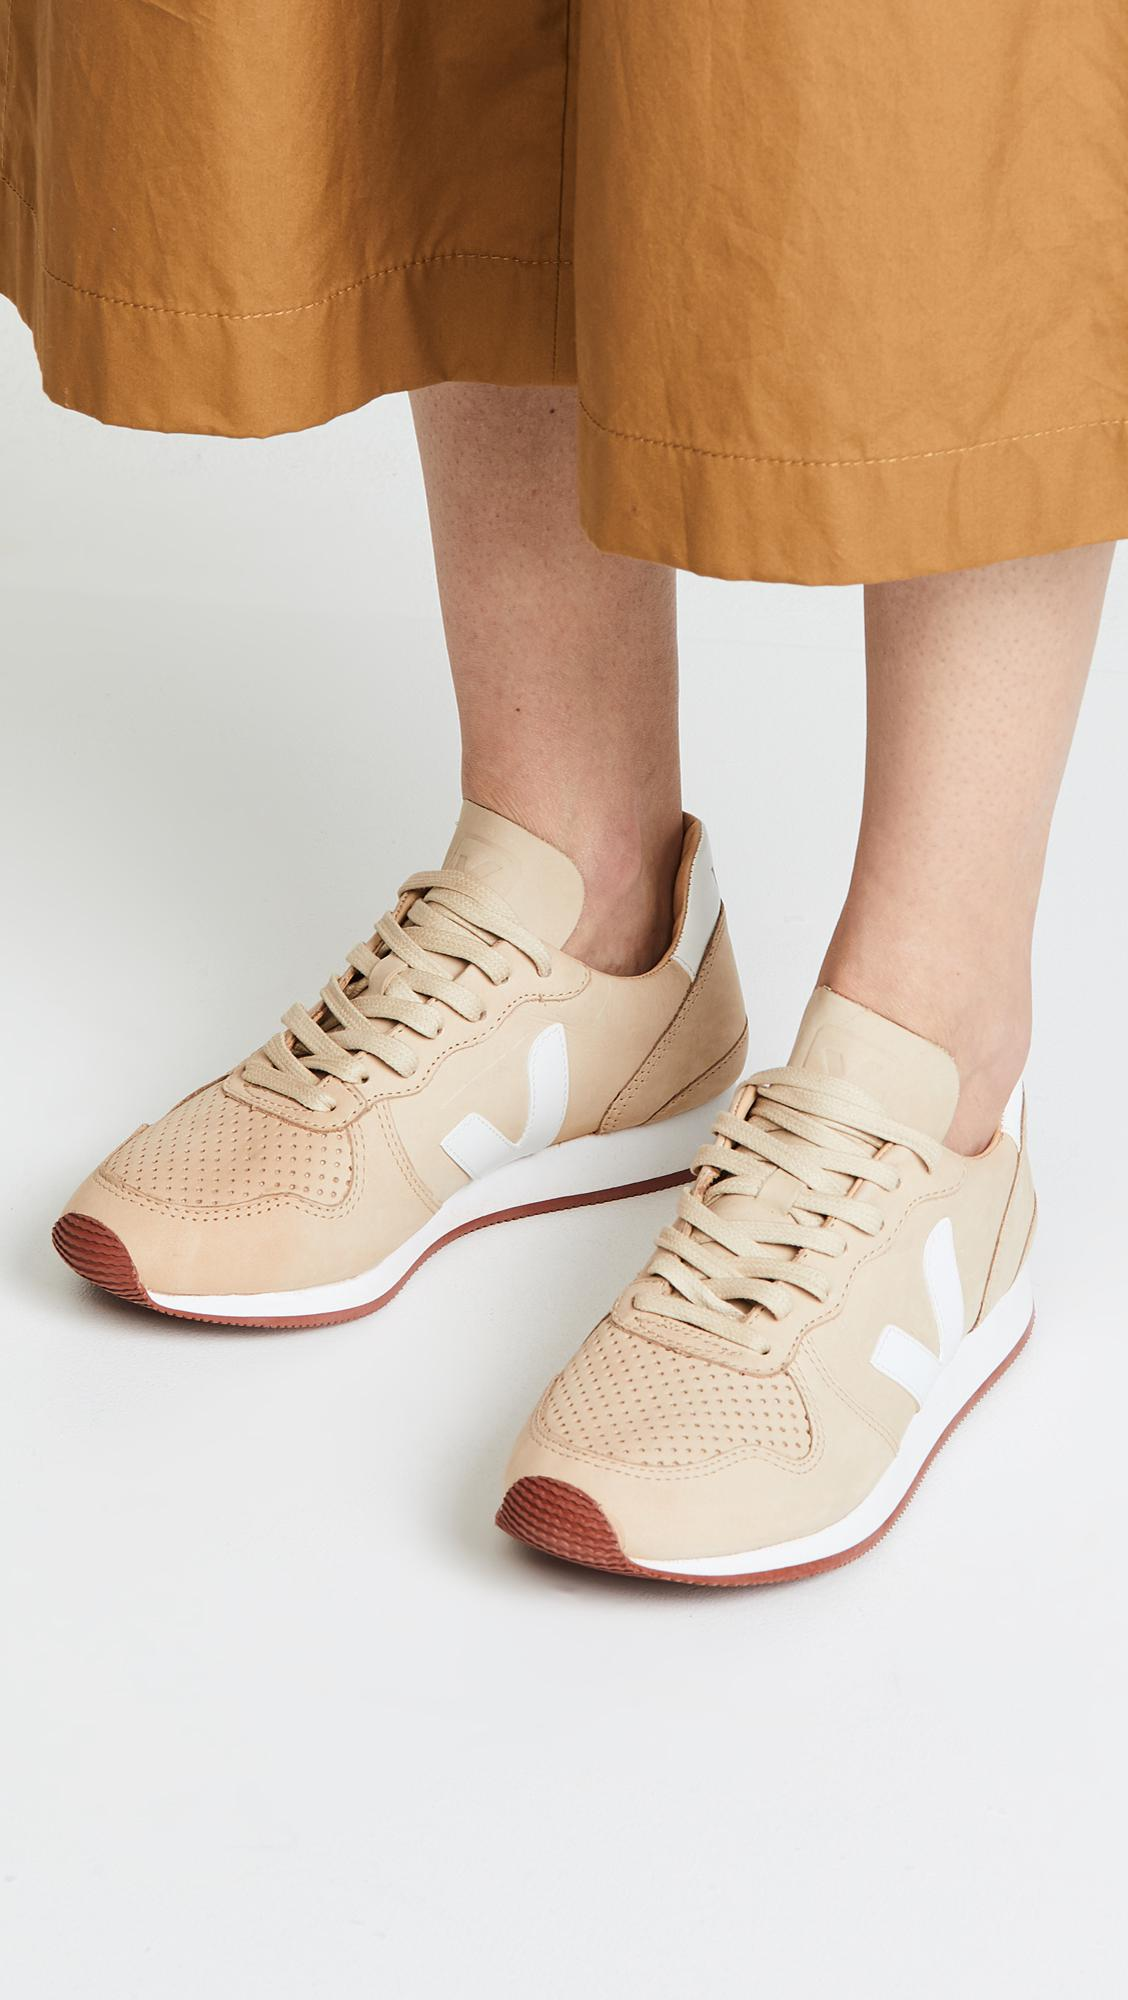 Veja Leather Holiday Bastille Sneakers